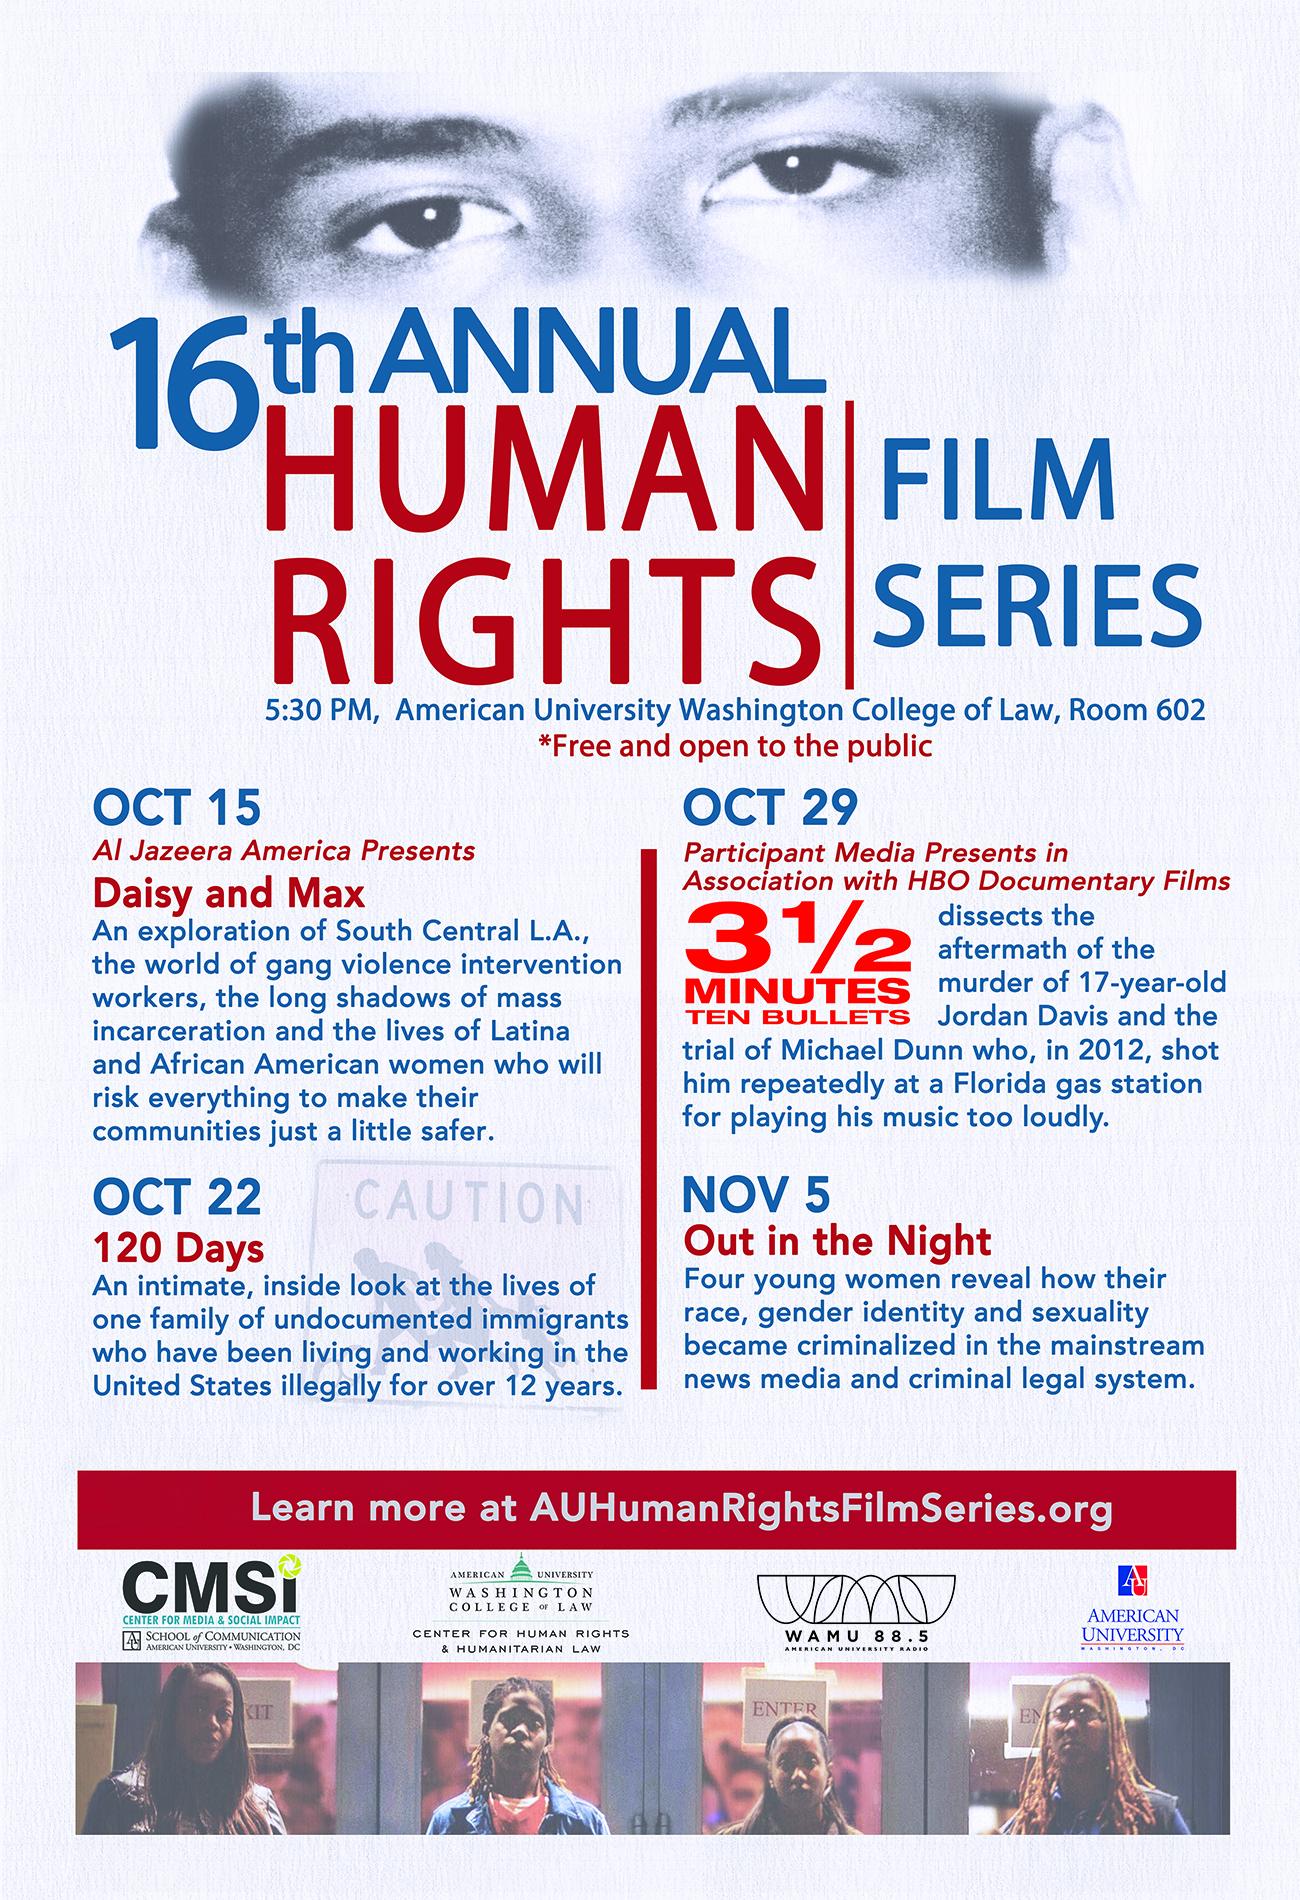 Human Rights Film Series